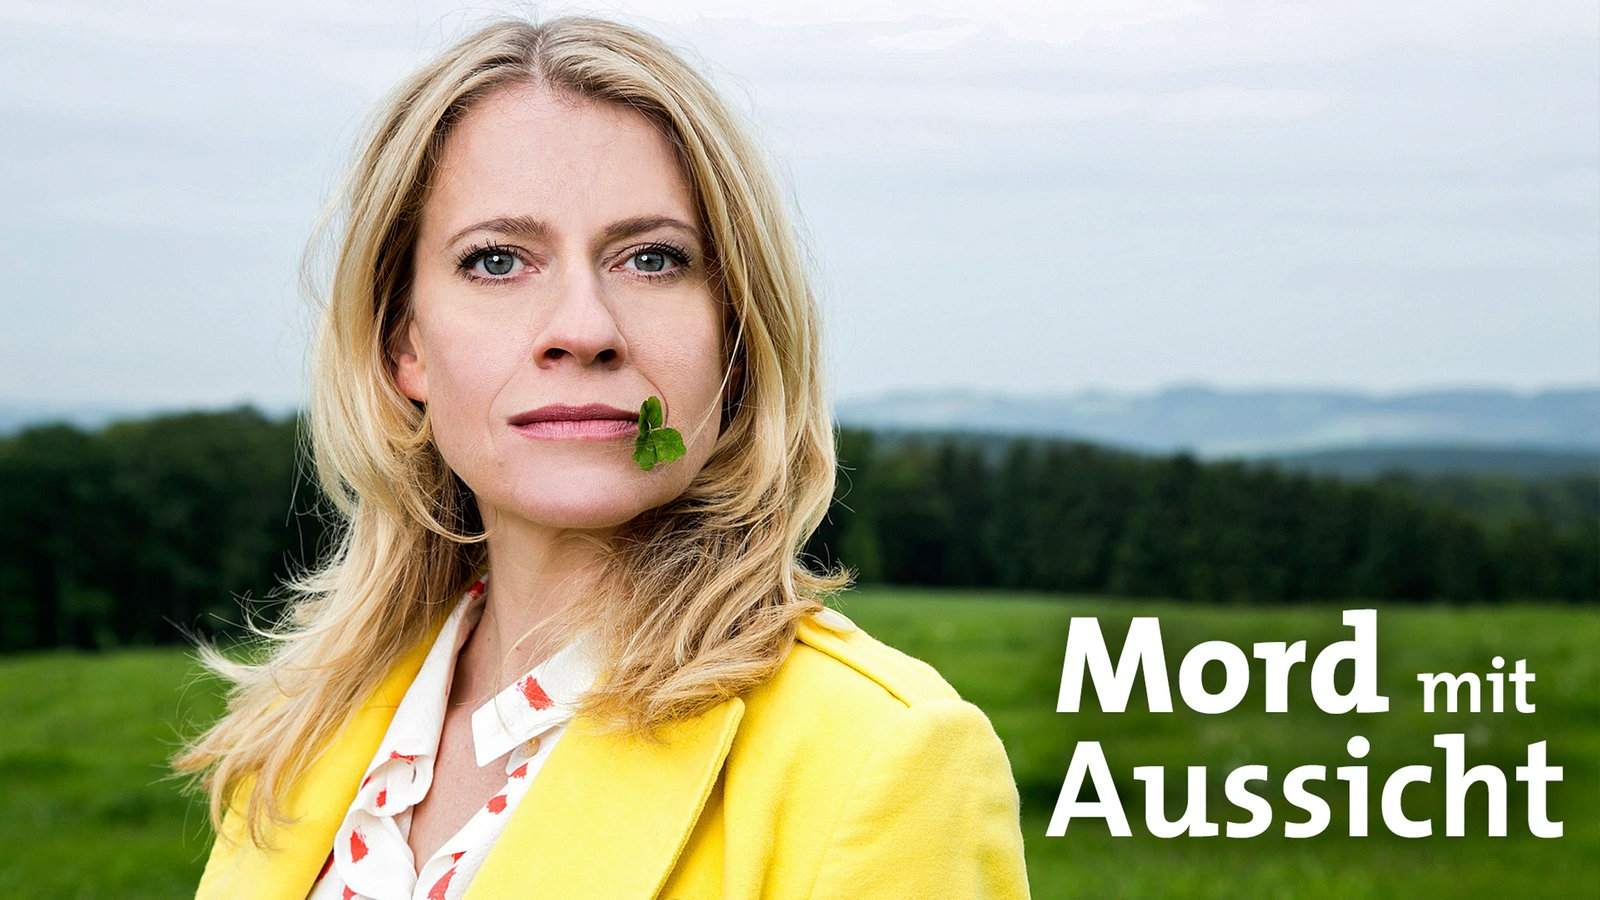 Mord mit Aussicht - Sendungen A-Z - Video - Mediathek - WDR